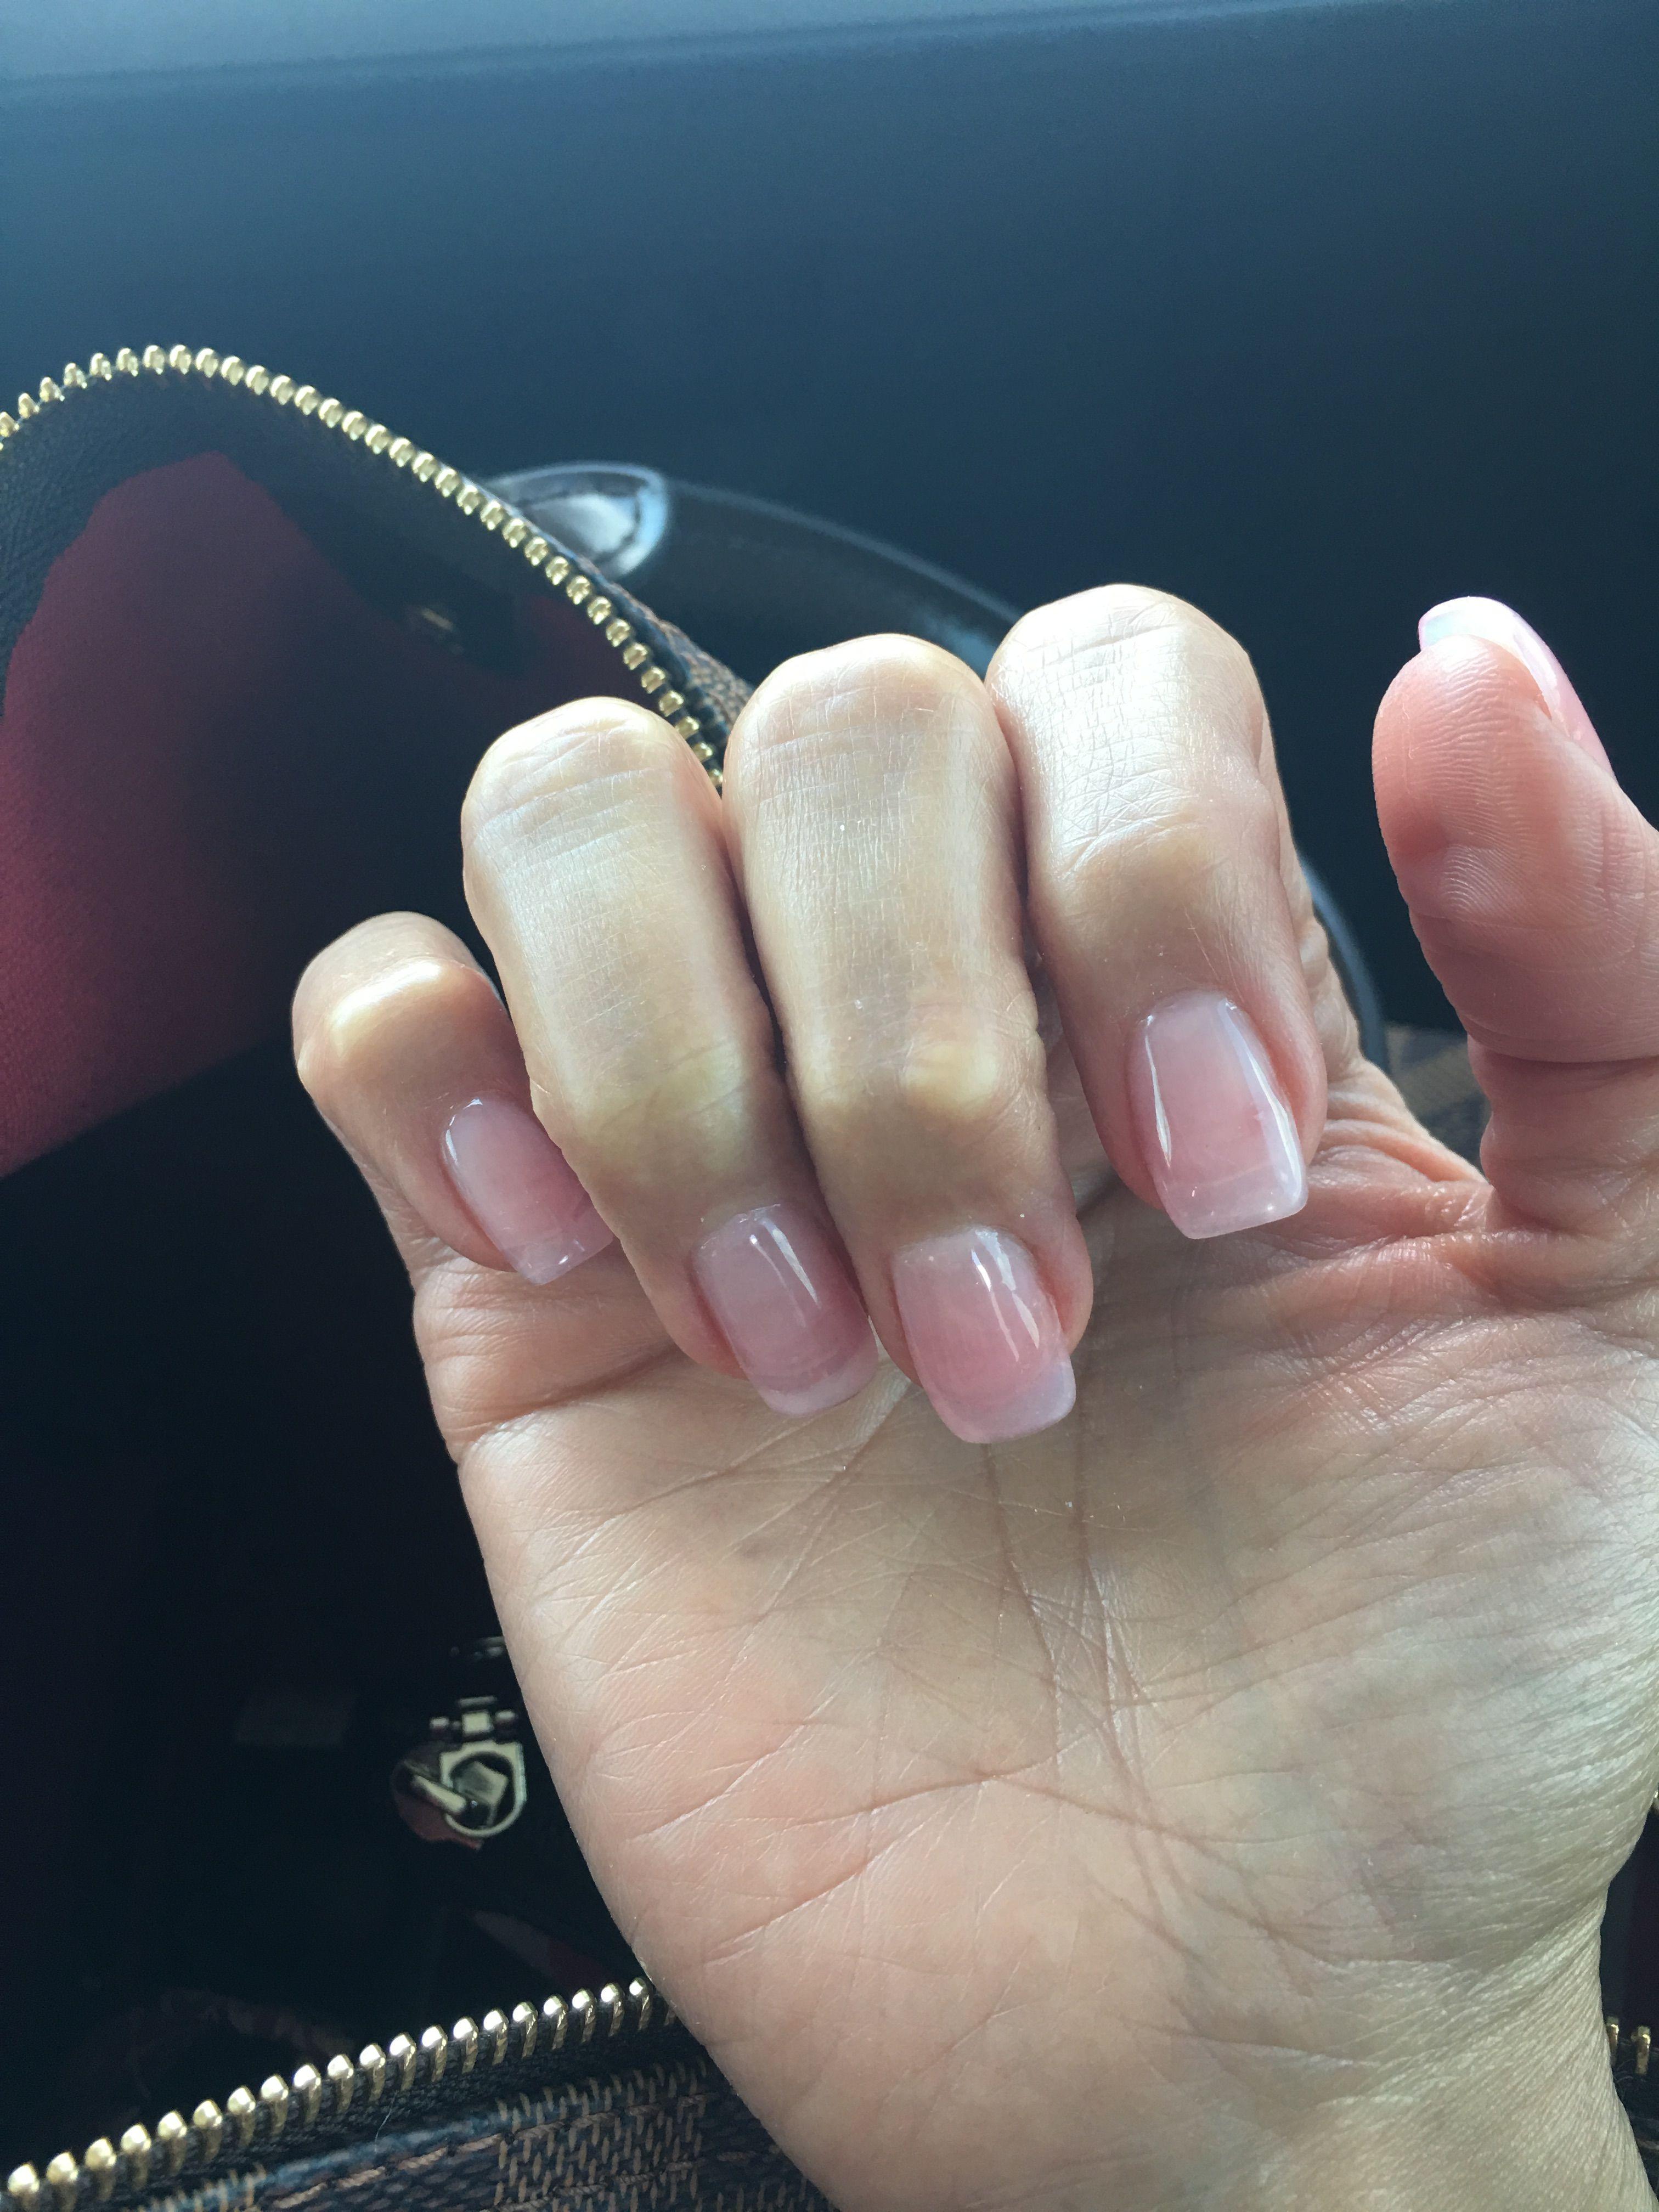 Artificial Nails For Sale Solar Nails Vs Acrylic Nails Fake Nails Glue On Nails Press On Nails Types Of Artificial Nails Types Of Nail Manicures Nails Shellac Nails Trendy Nails